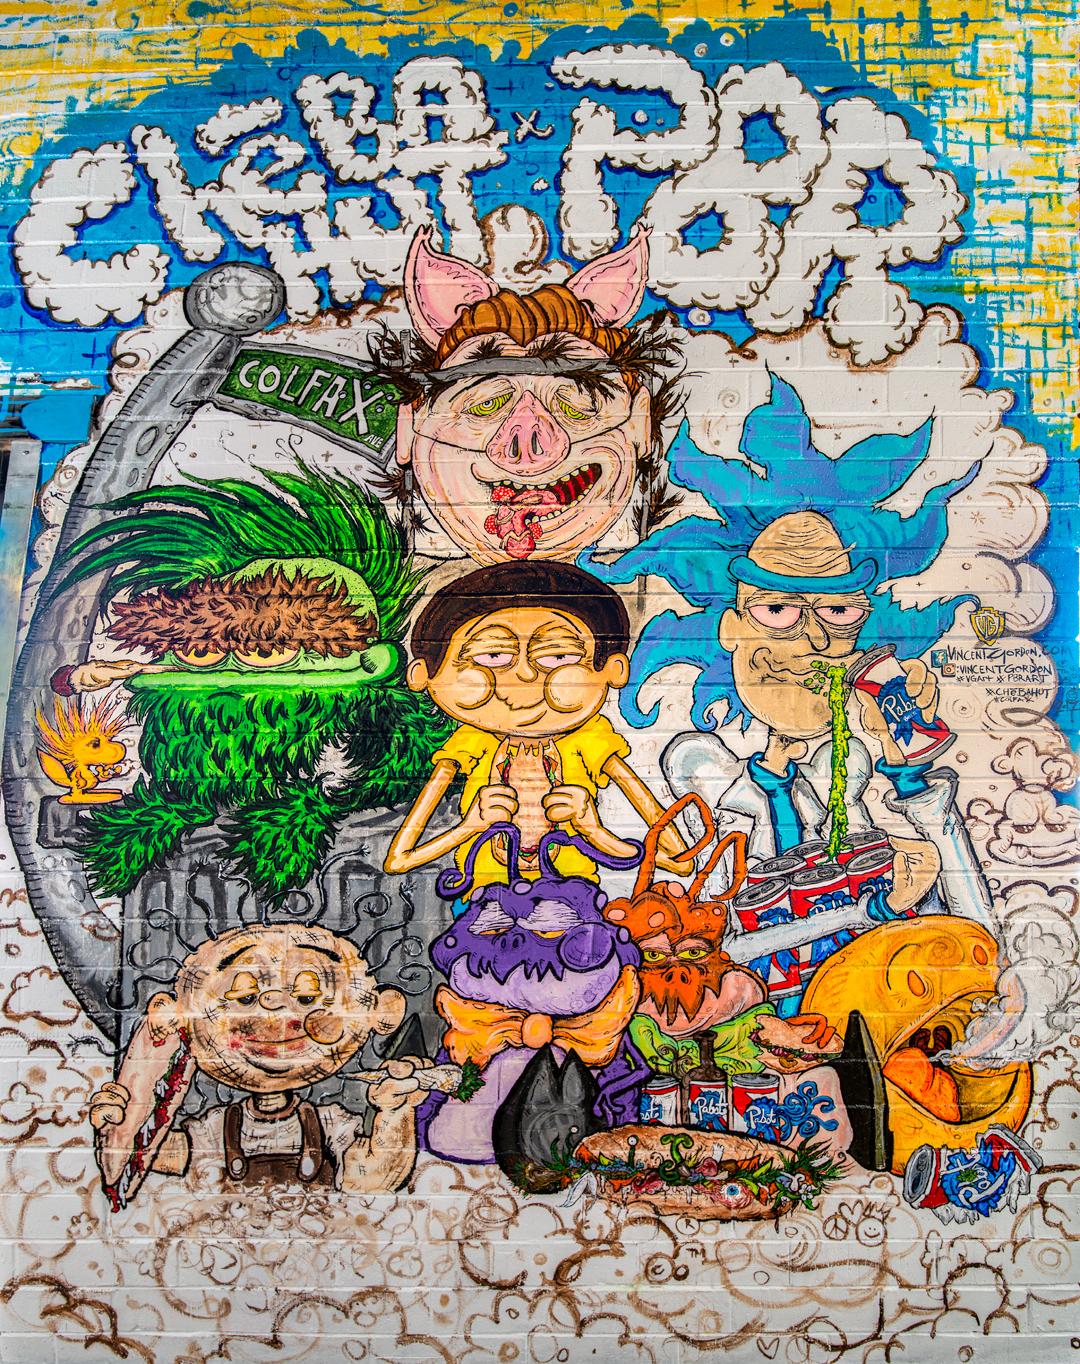 Vincent Gordon mural sponsored by PBR at Cheba Hut (638 East Colfax Ave, Denver CO)